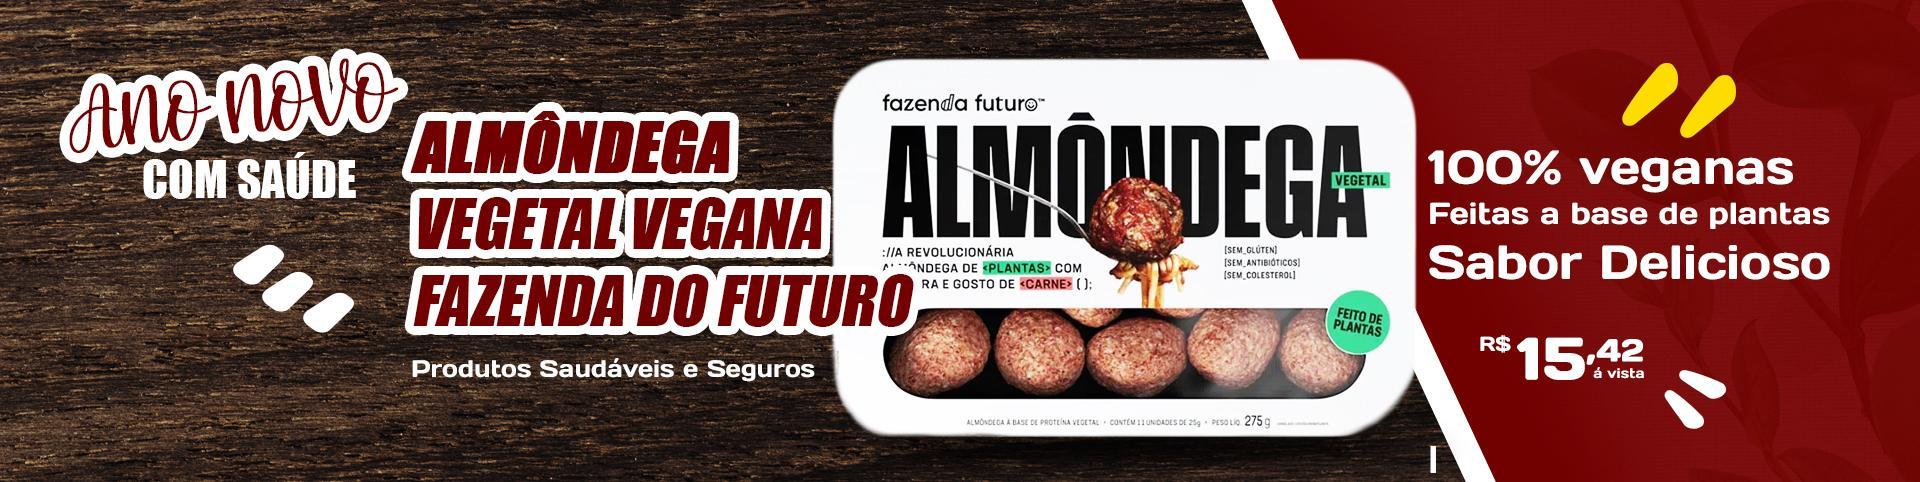 Fazenda do futuro almodega